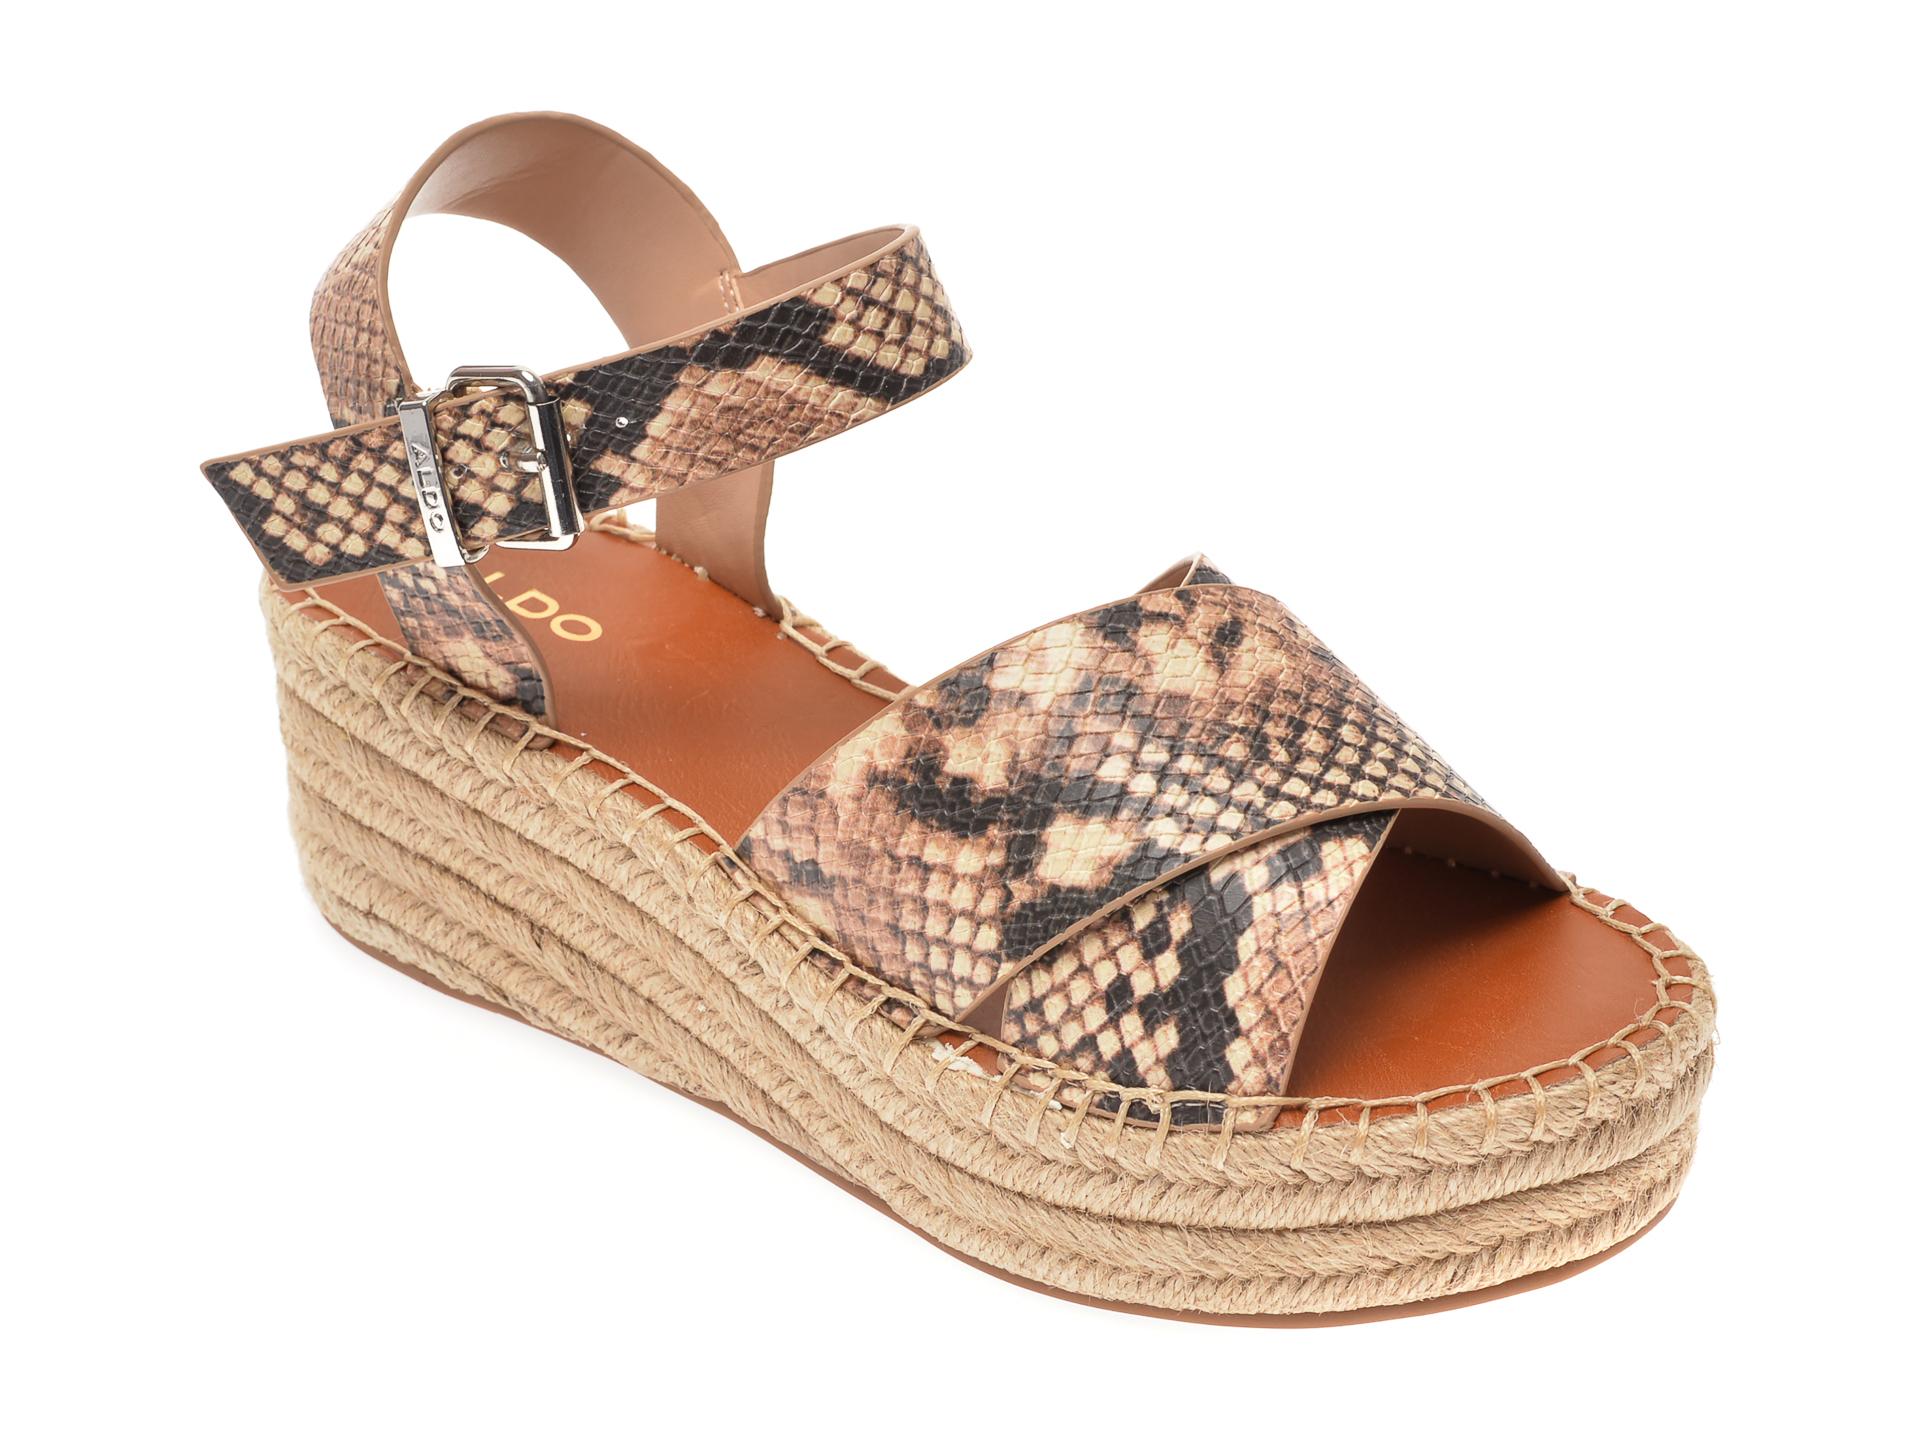 Sandale ALDO bej, Tineviel101, din piele ecologica imagine otter.ro